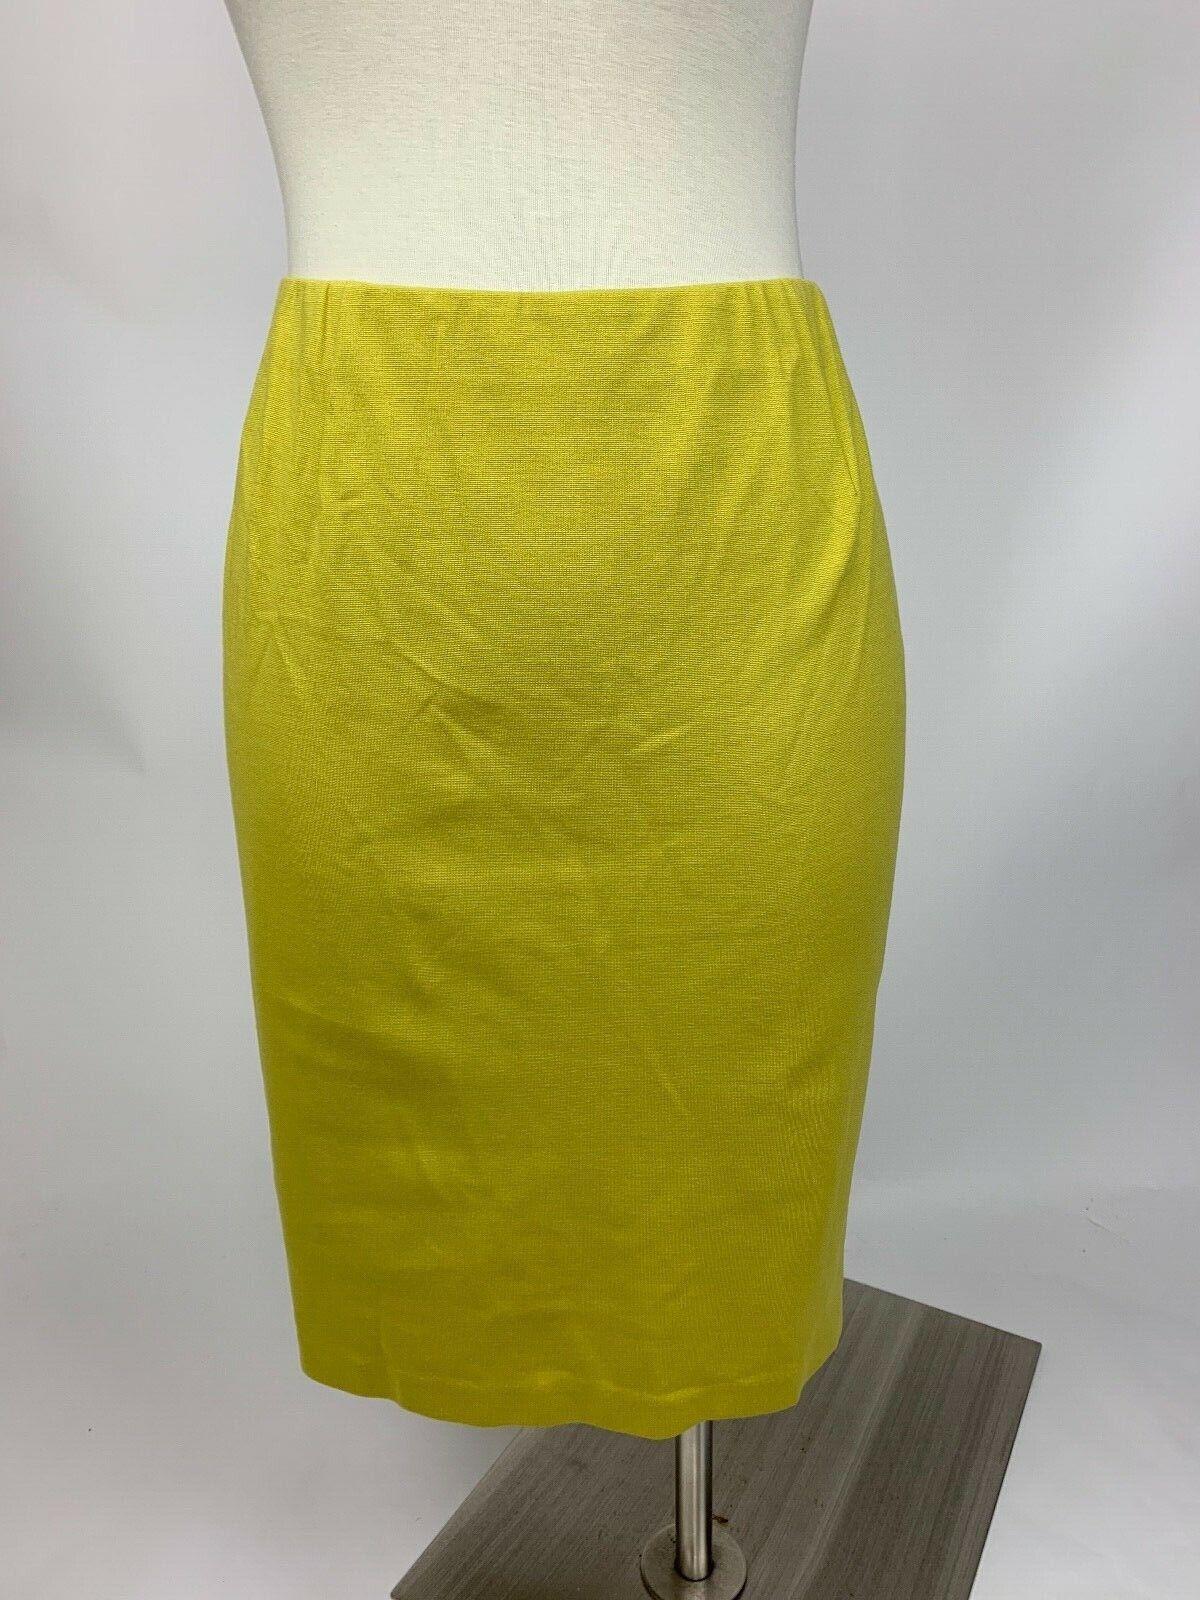 J. Jill Mustard Yellow Ponte Straight Pencil Skirt Stretch Medium Excellent